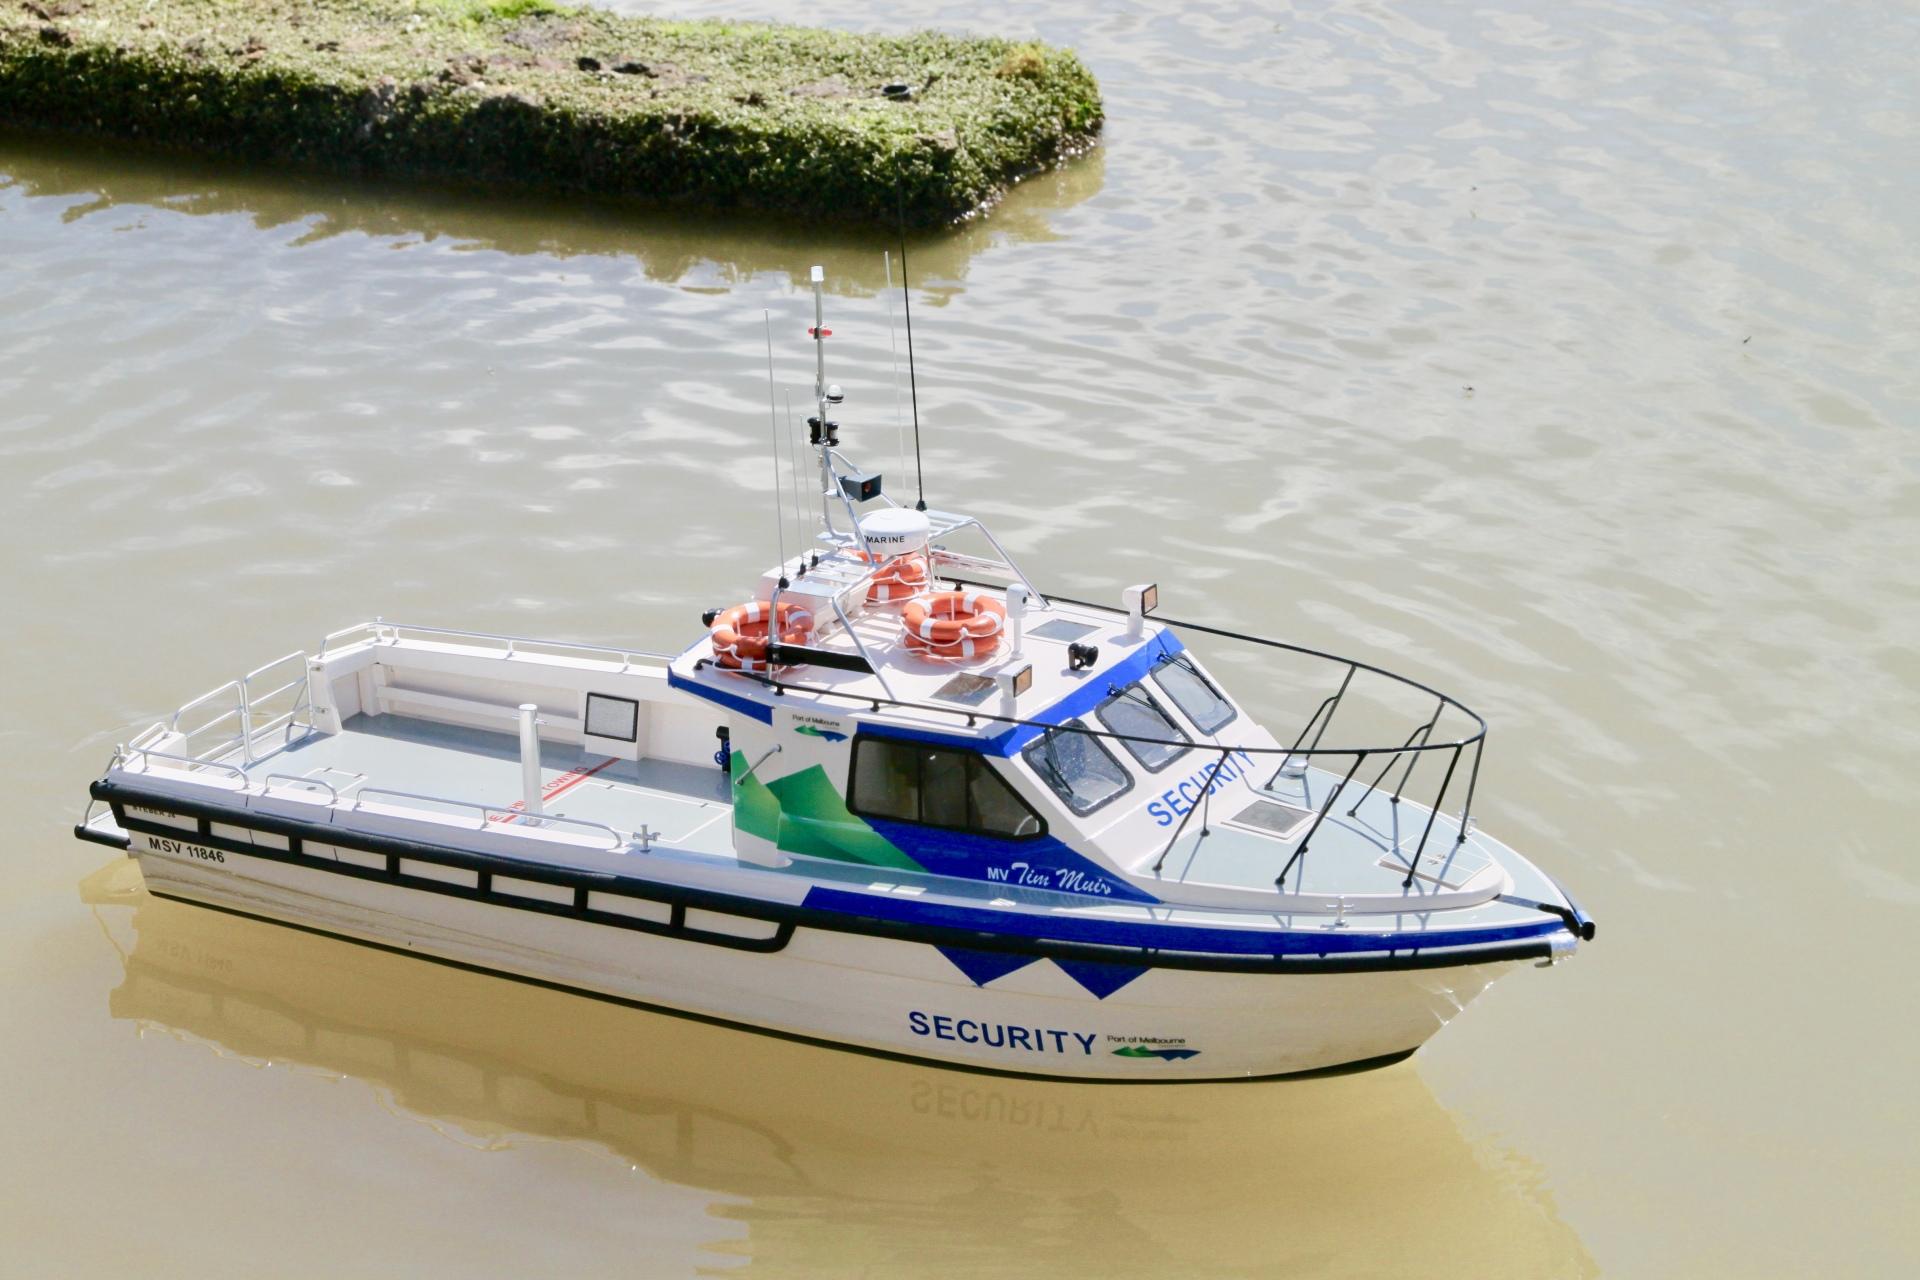 Roy's Australian patrol boat